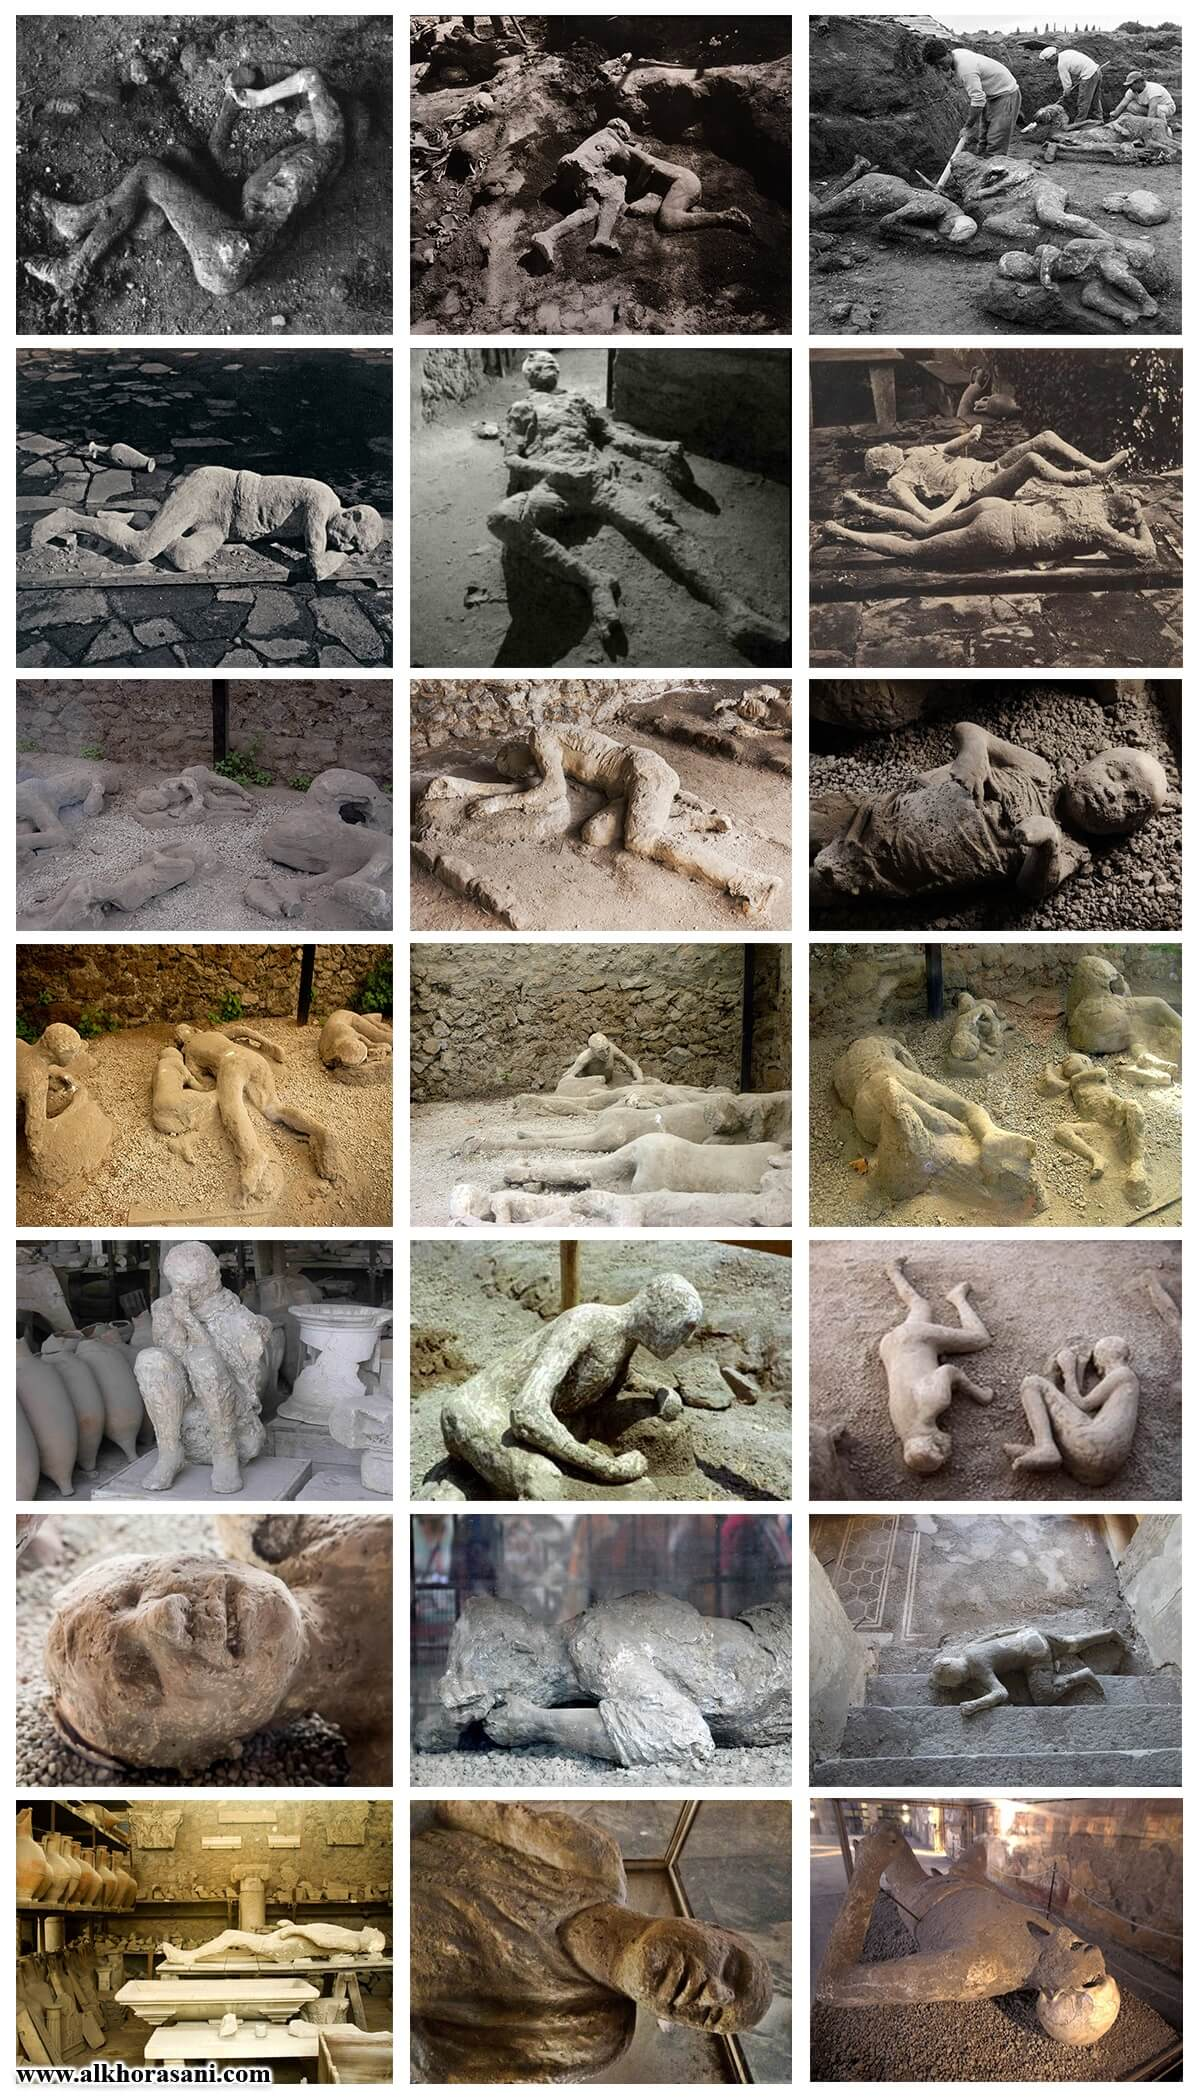 اجساد اهل پمپئی